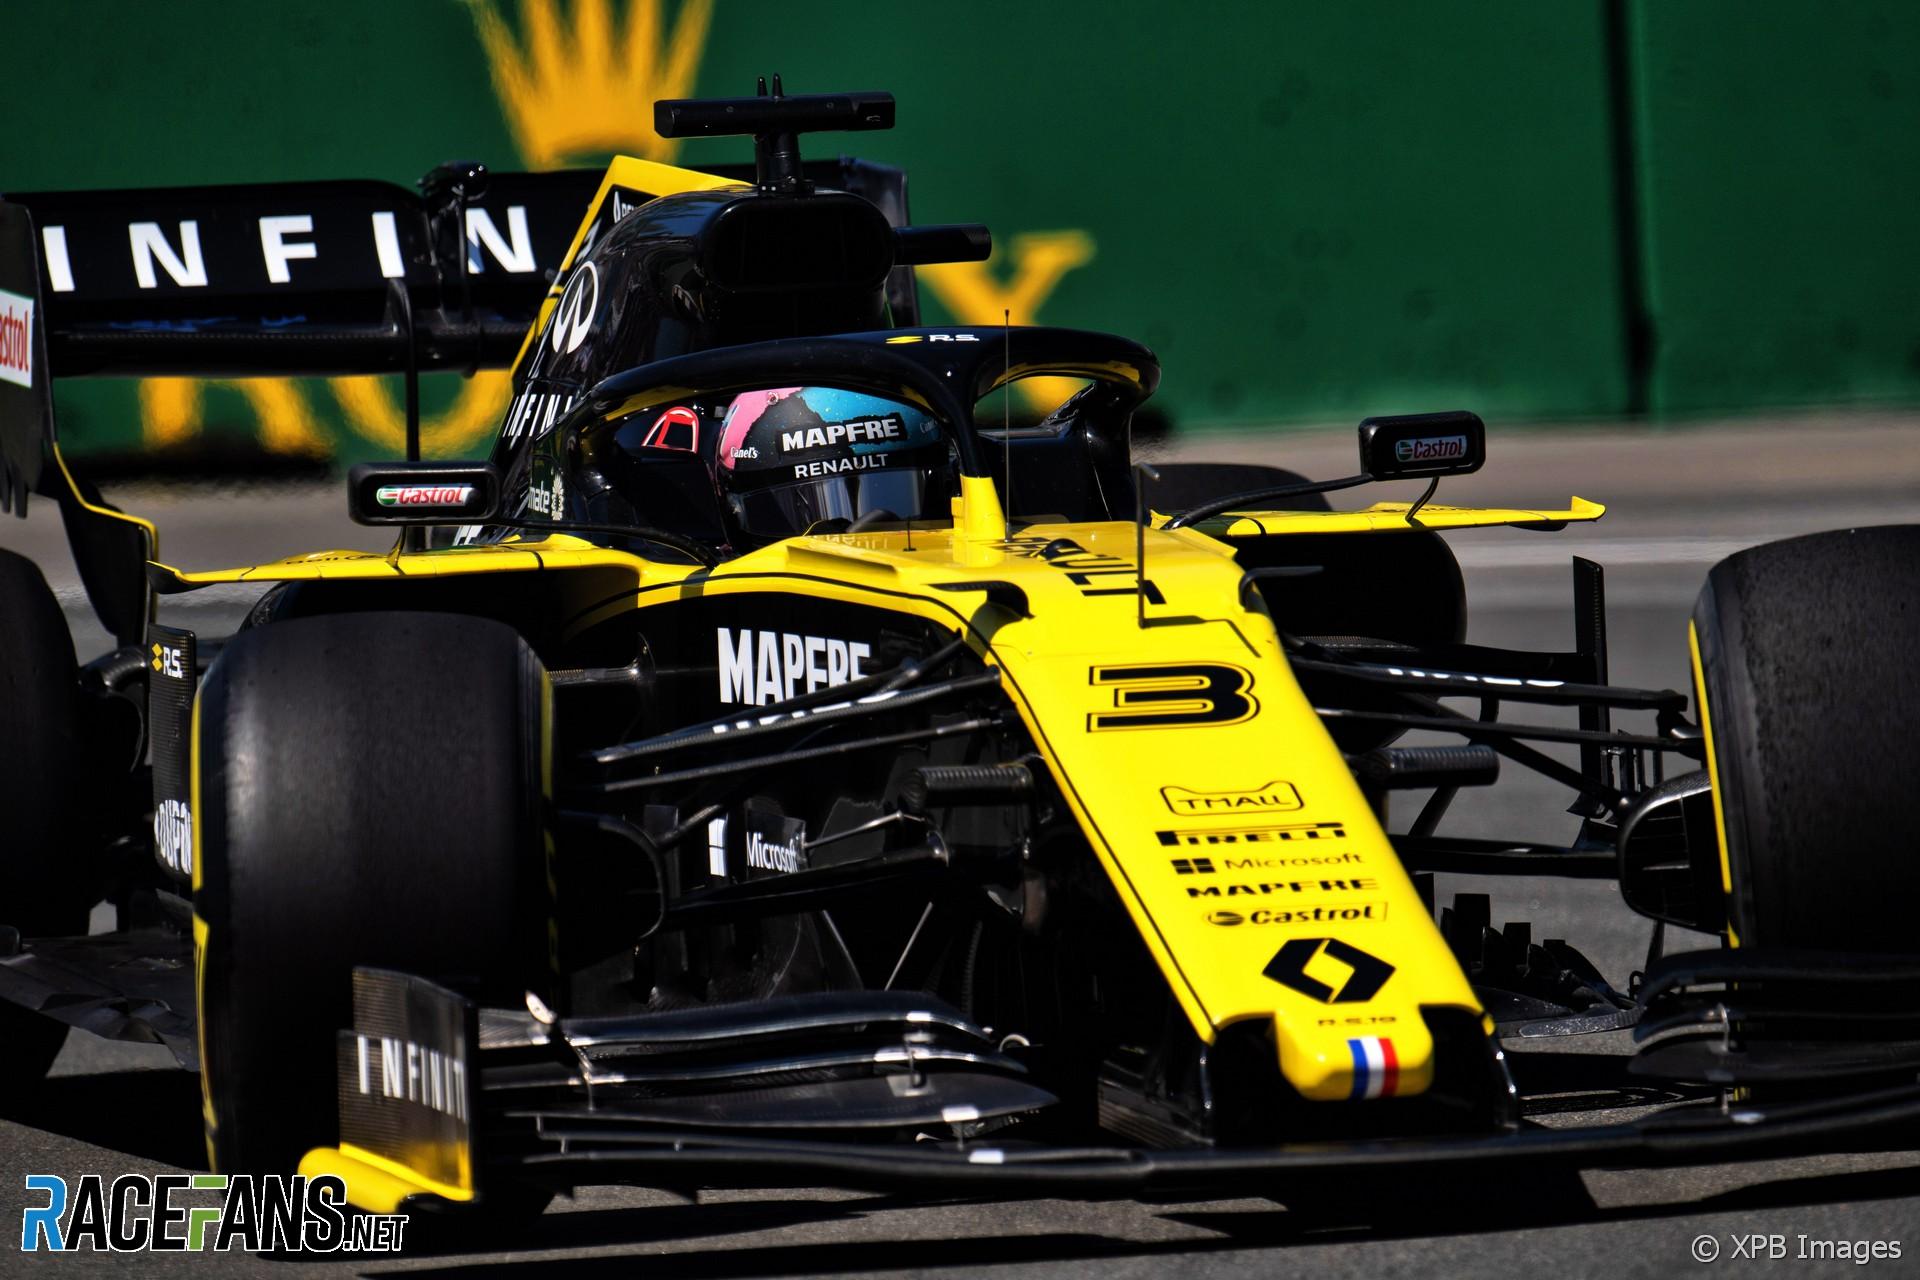 F1 Second Row Start Better Than Beating Red Bull For Ricciardo Racefans